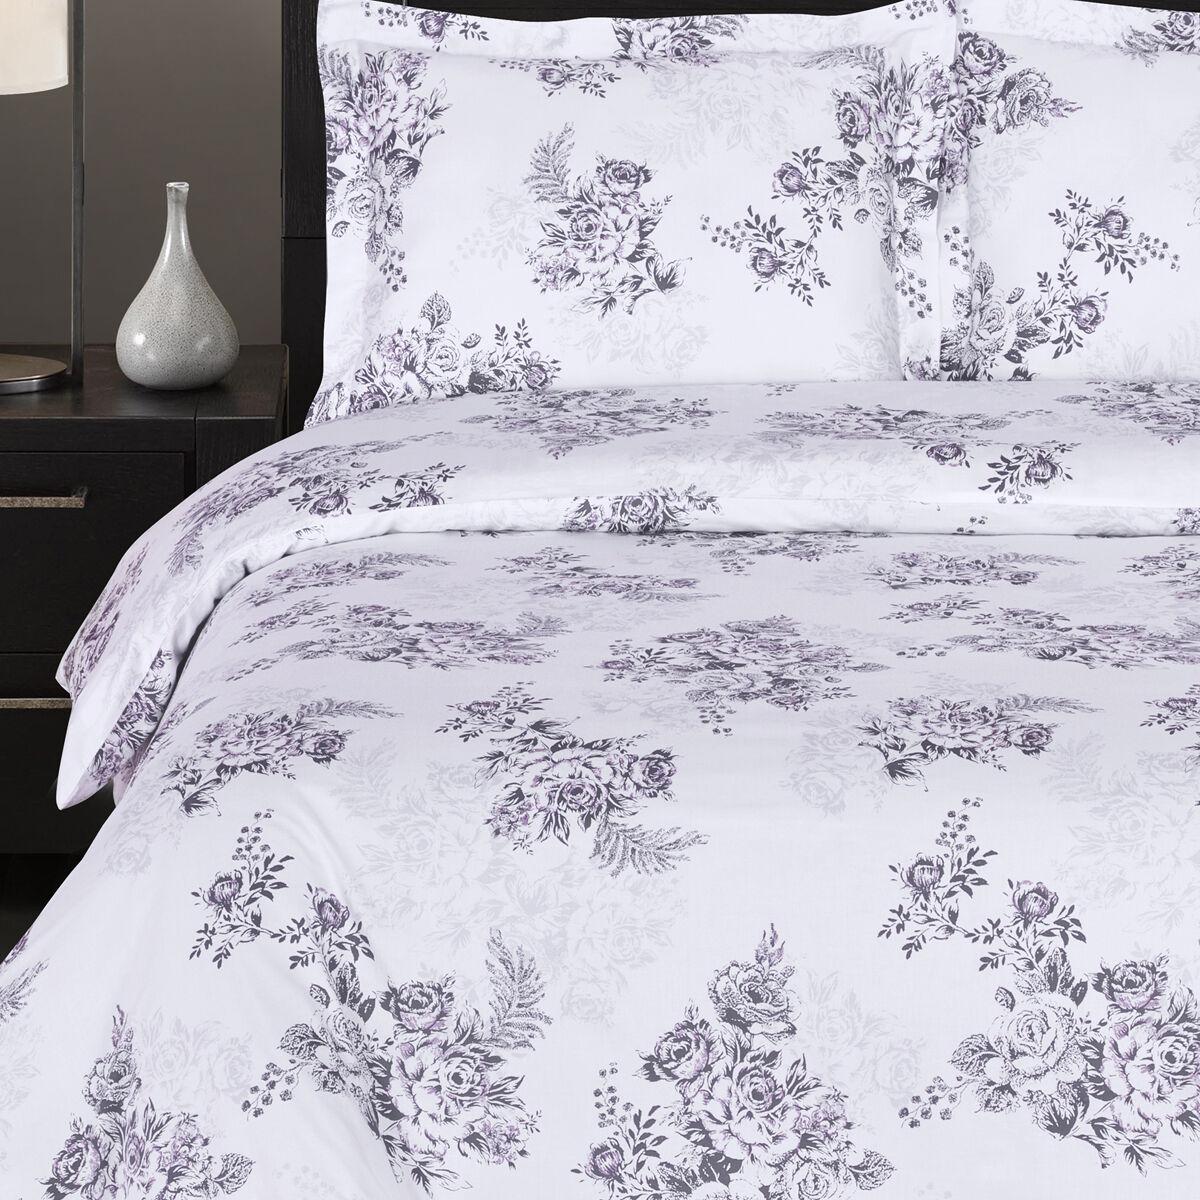 Bally Soft Reversible Duvet Cover Set,3PC fashionable floral Printed Duvet Cover